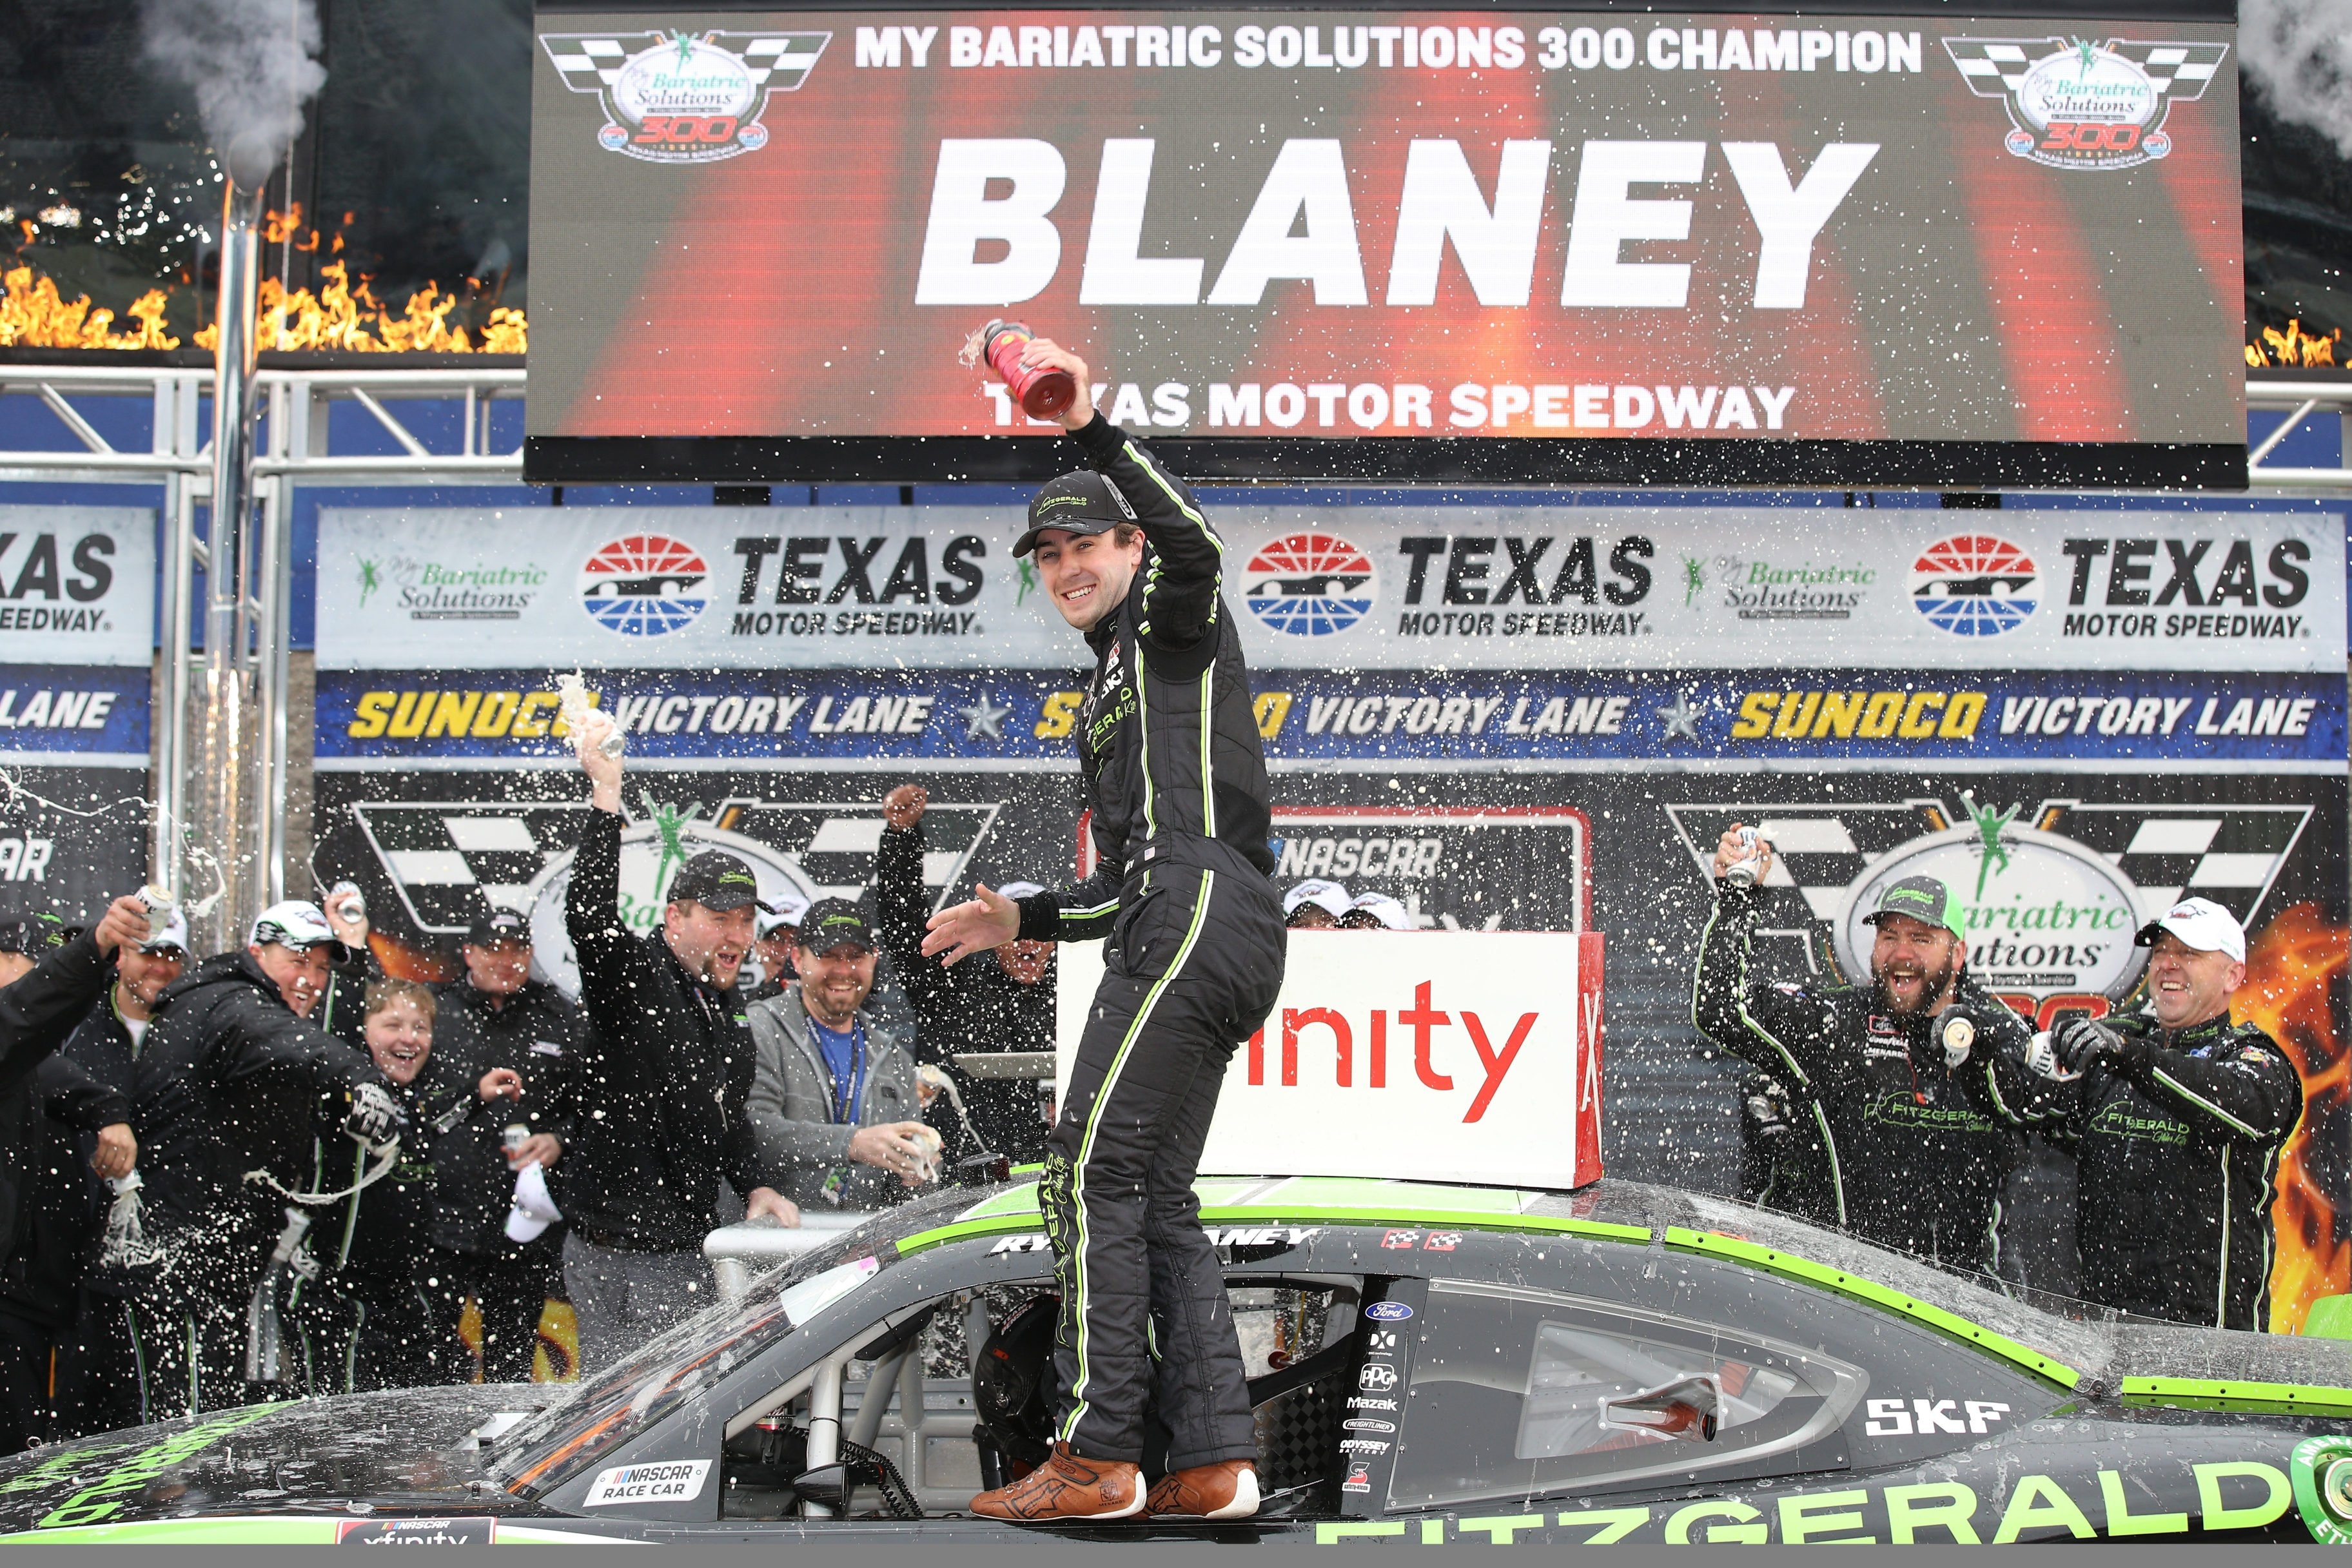 Ryan Blaney in victory lane - NASCAR Xfinity Series